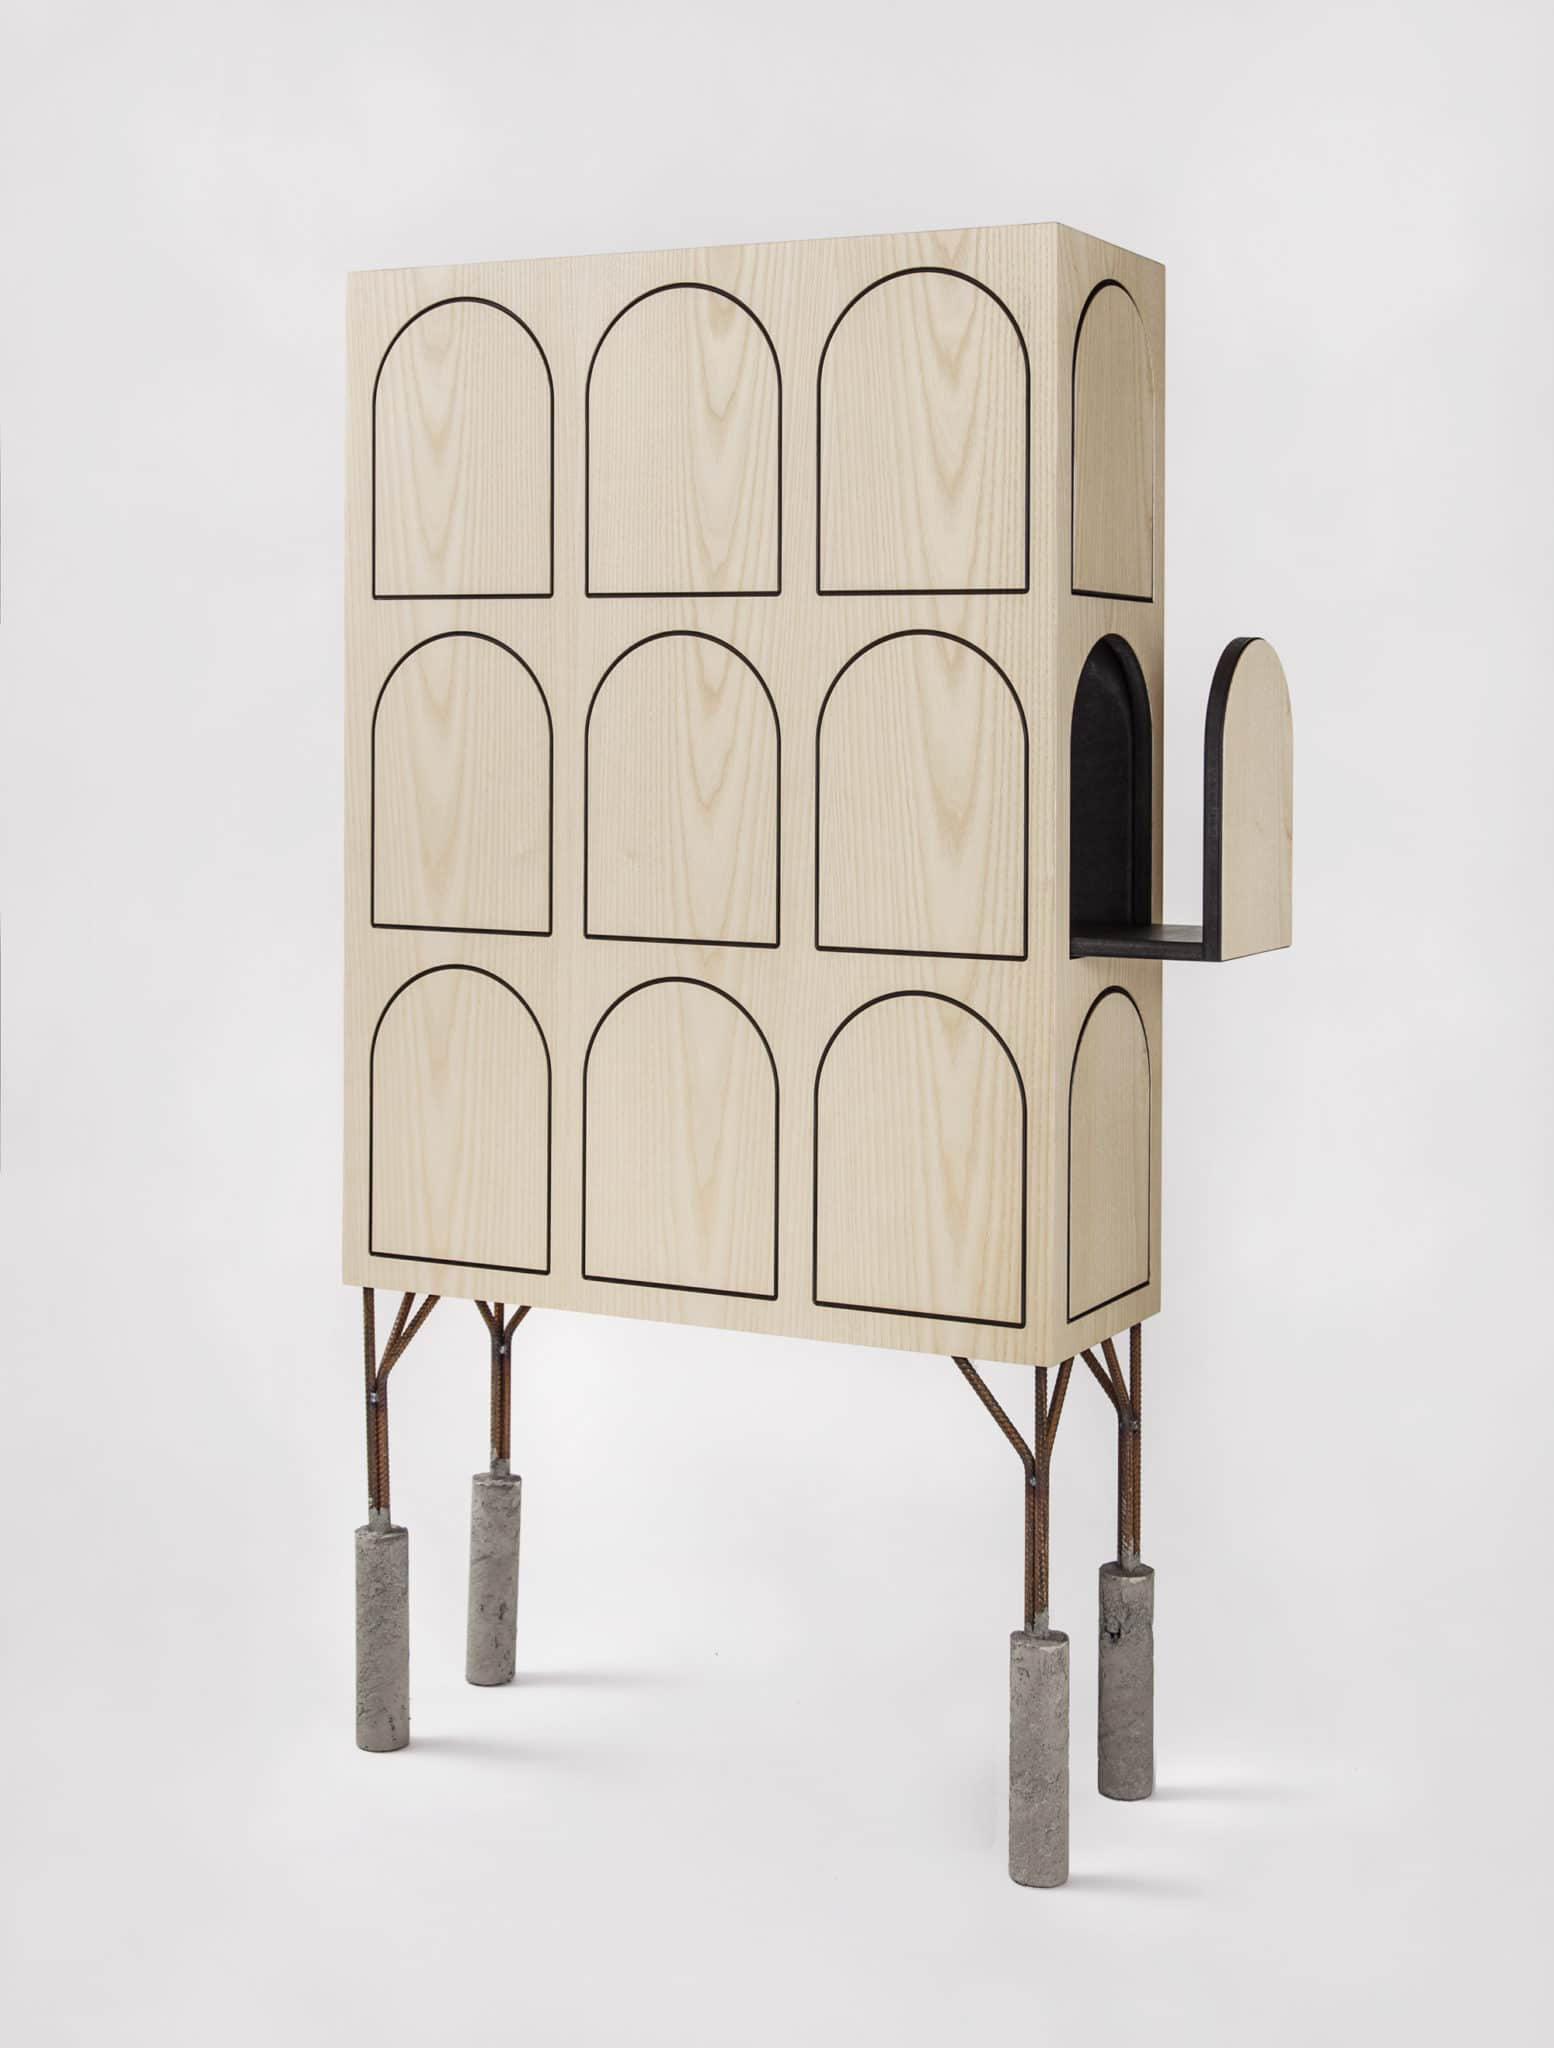 London Design Festival 2019: Adorno présente l'exposition Crossovers